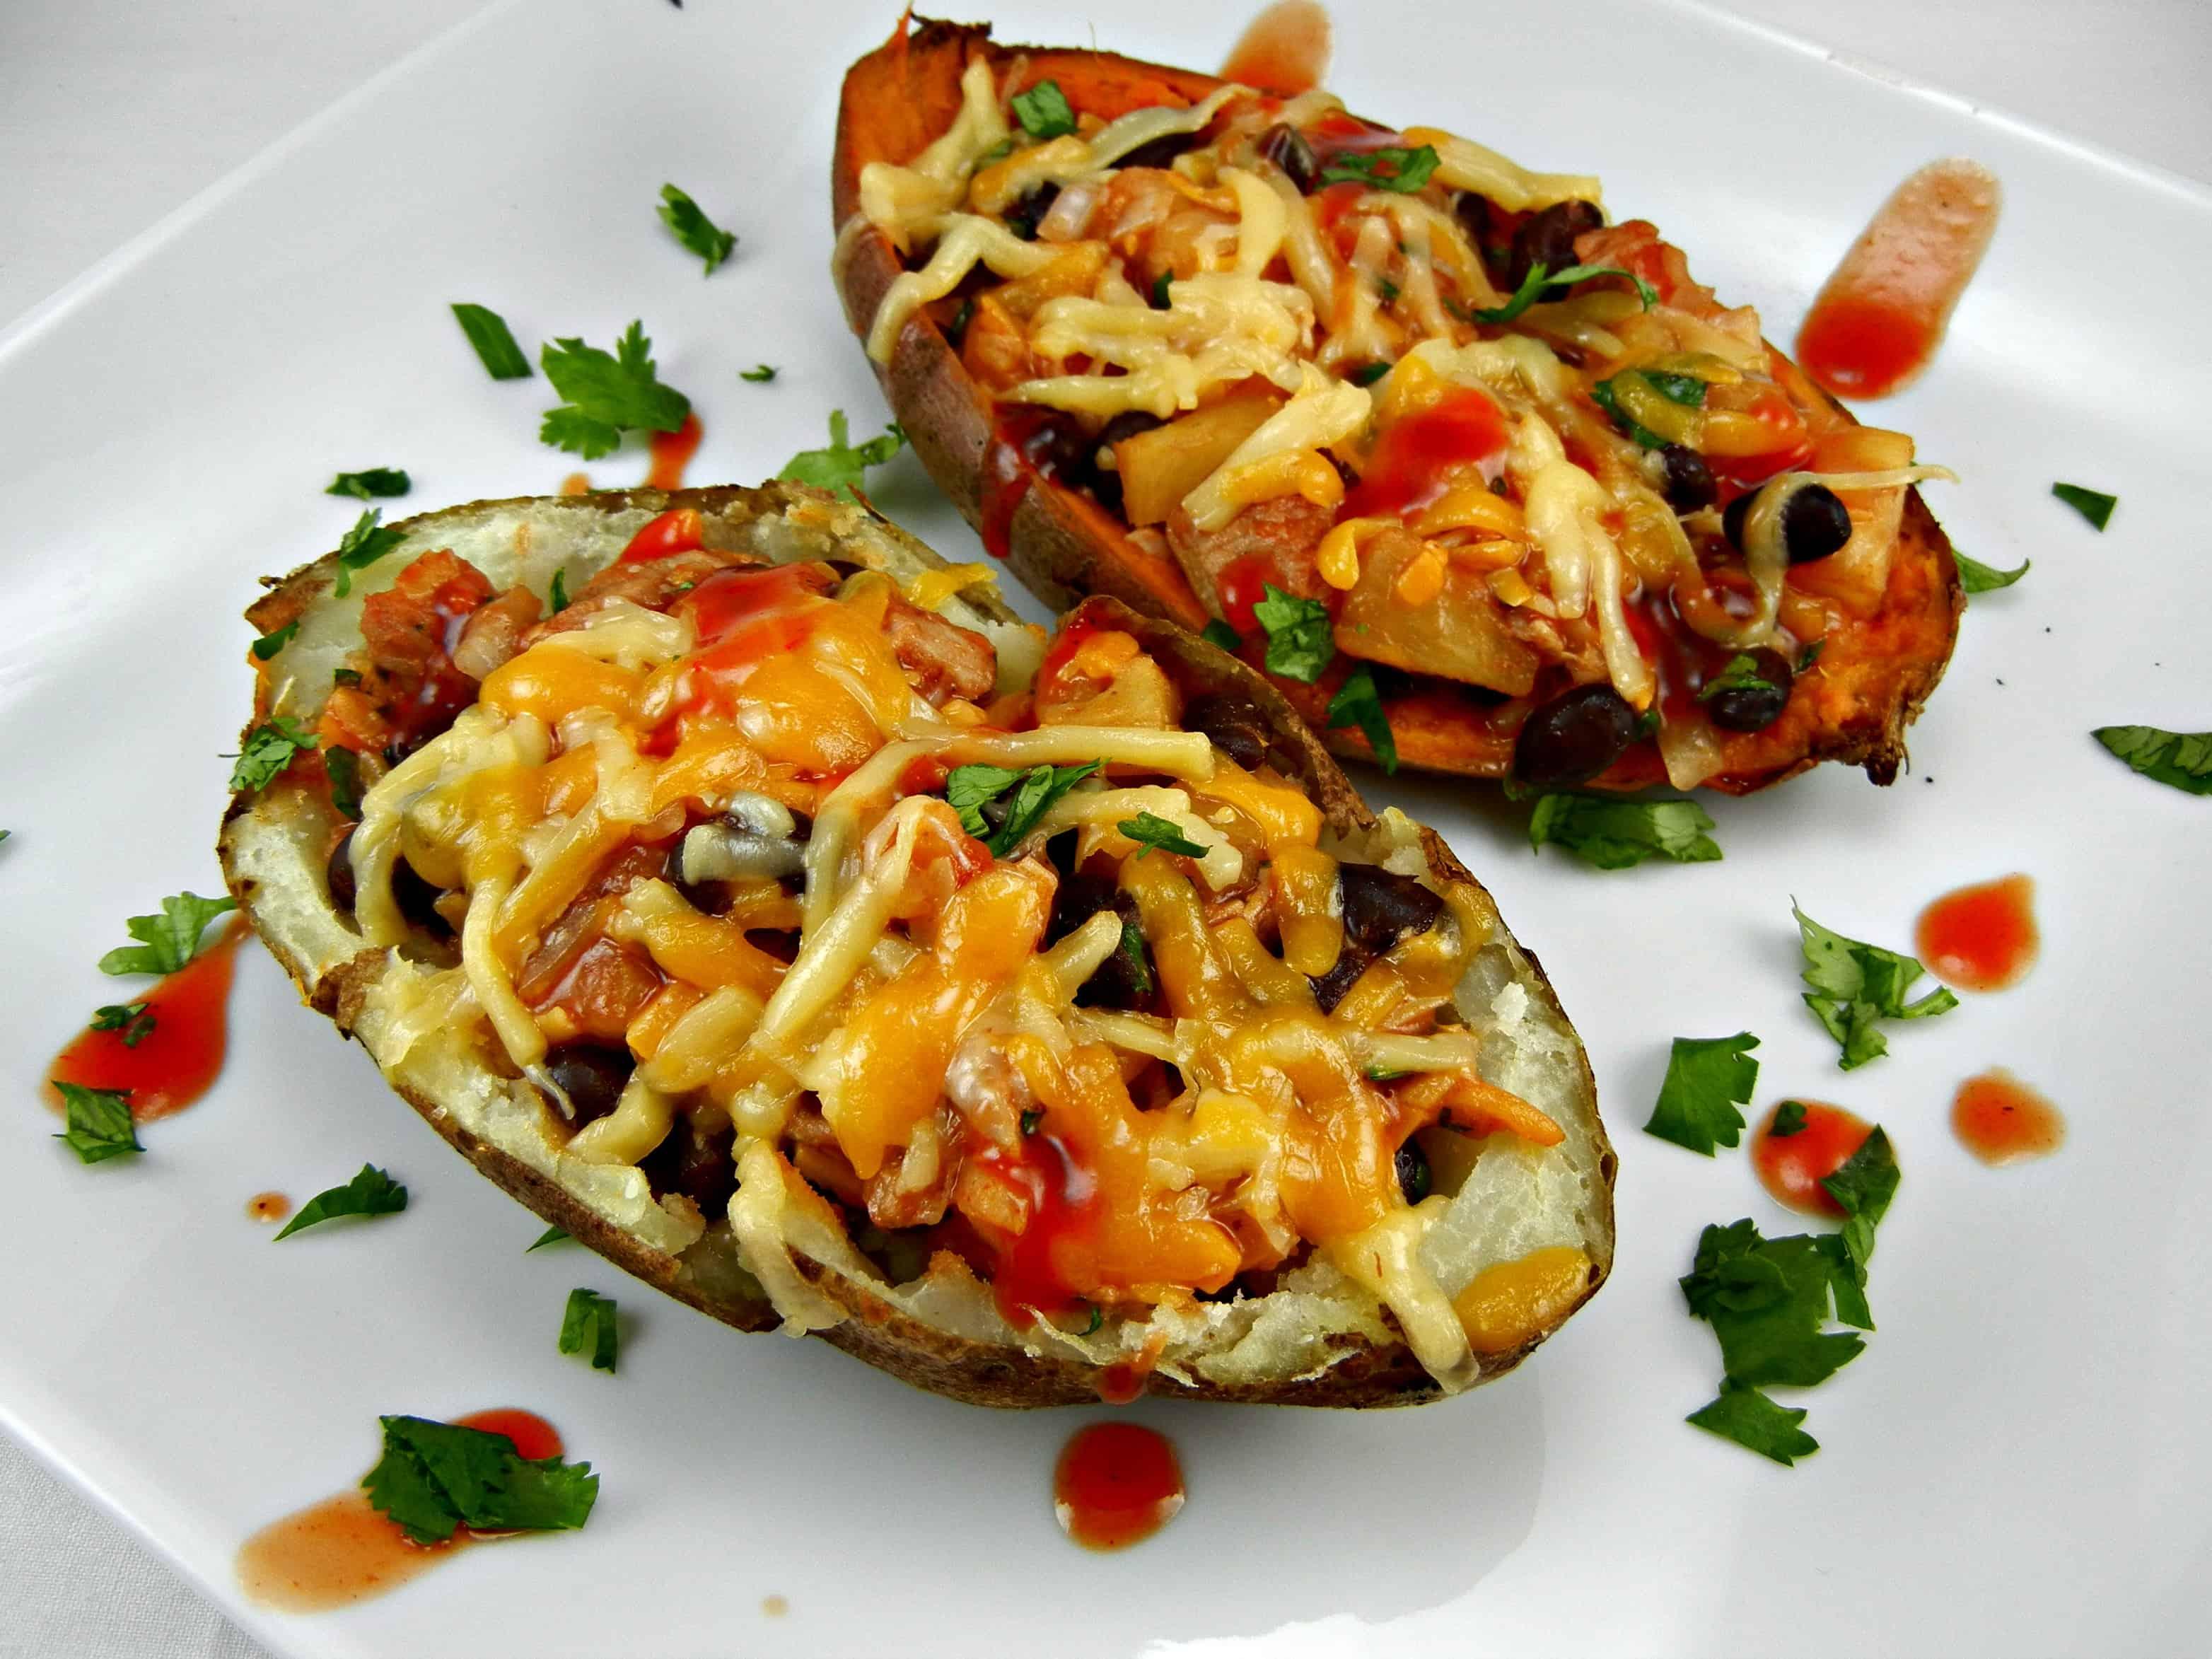 Barbecue Chicken and Coleslaw Potato Skins Recipe